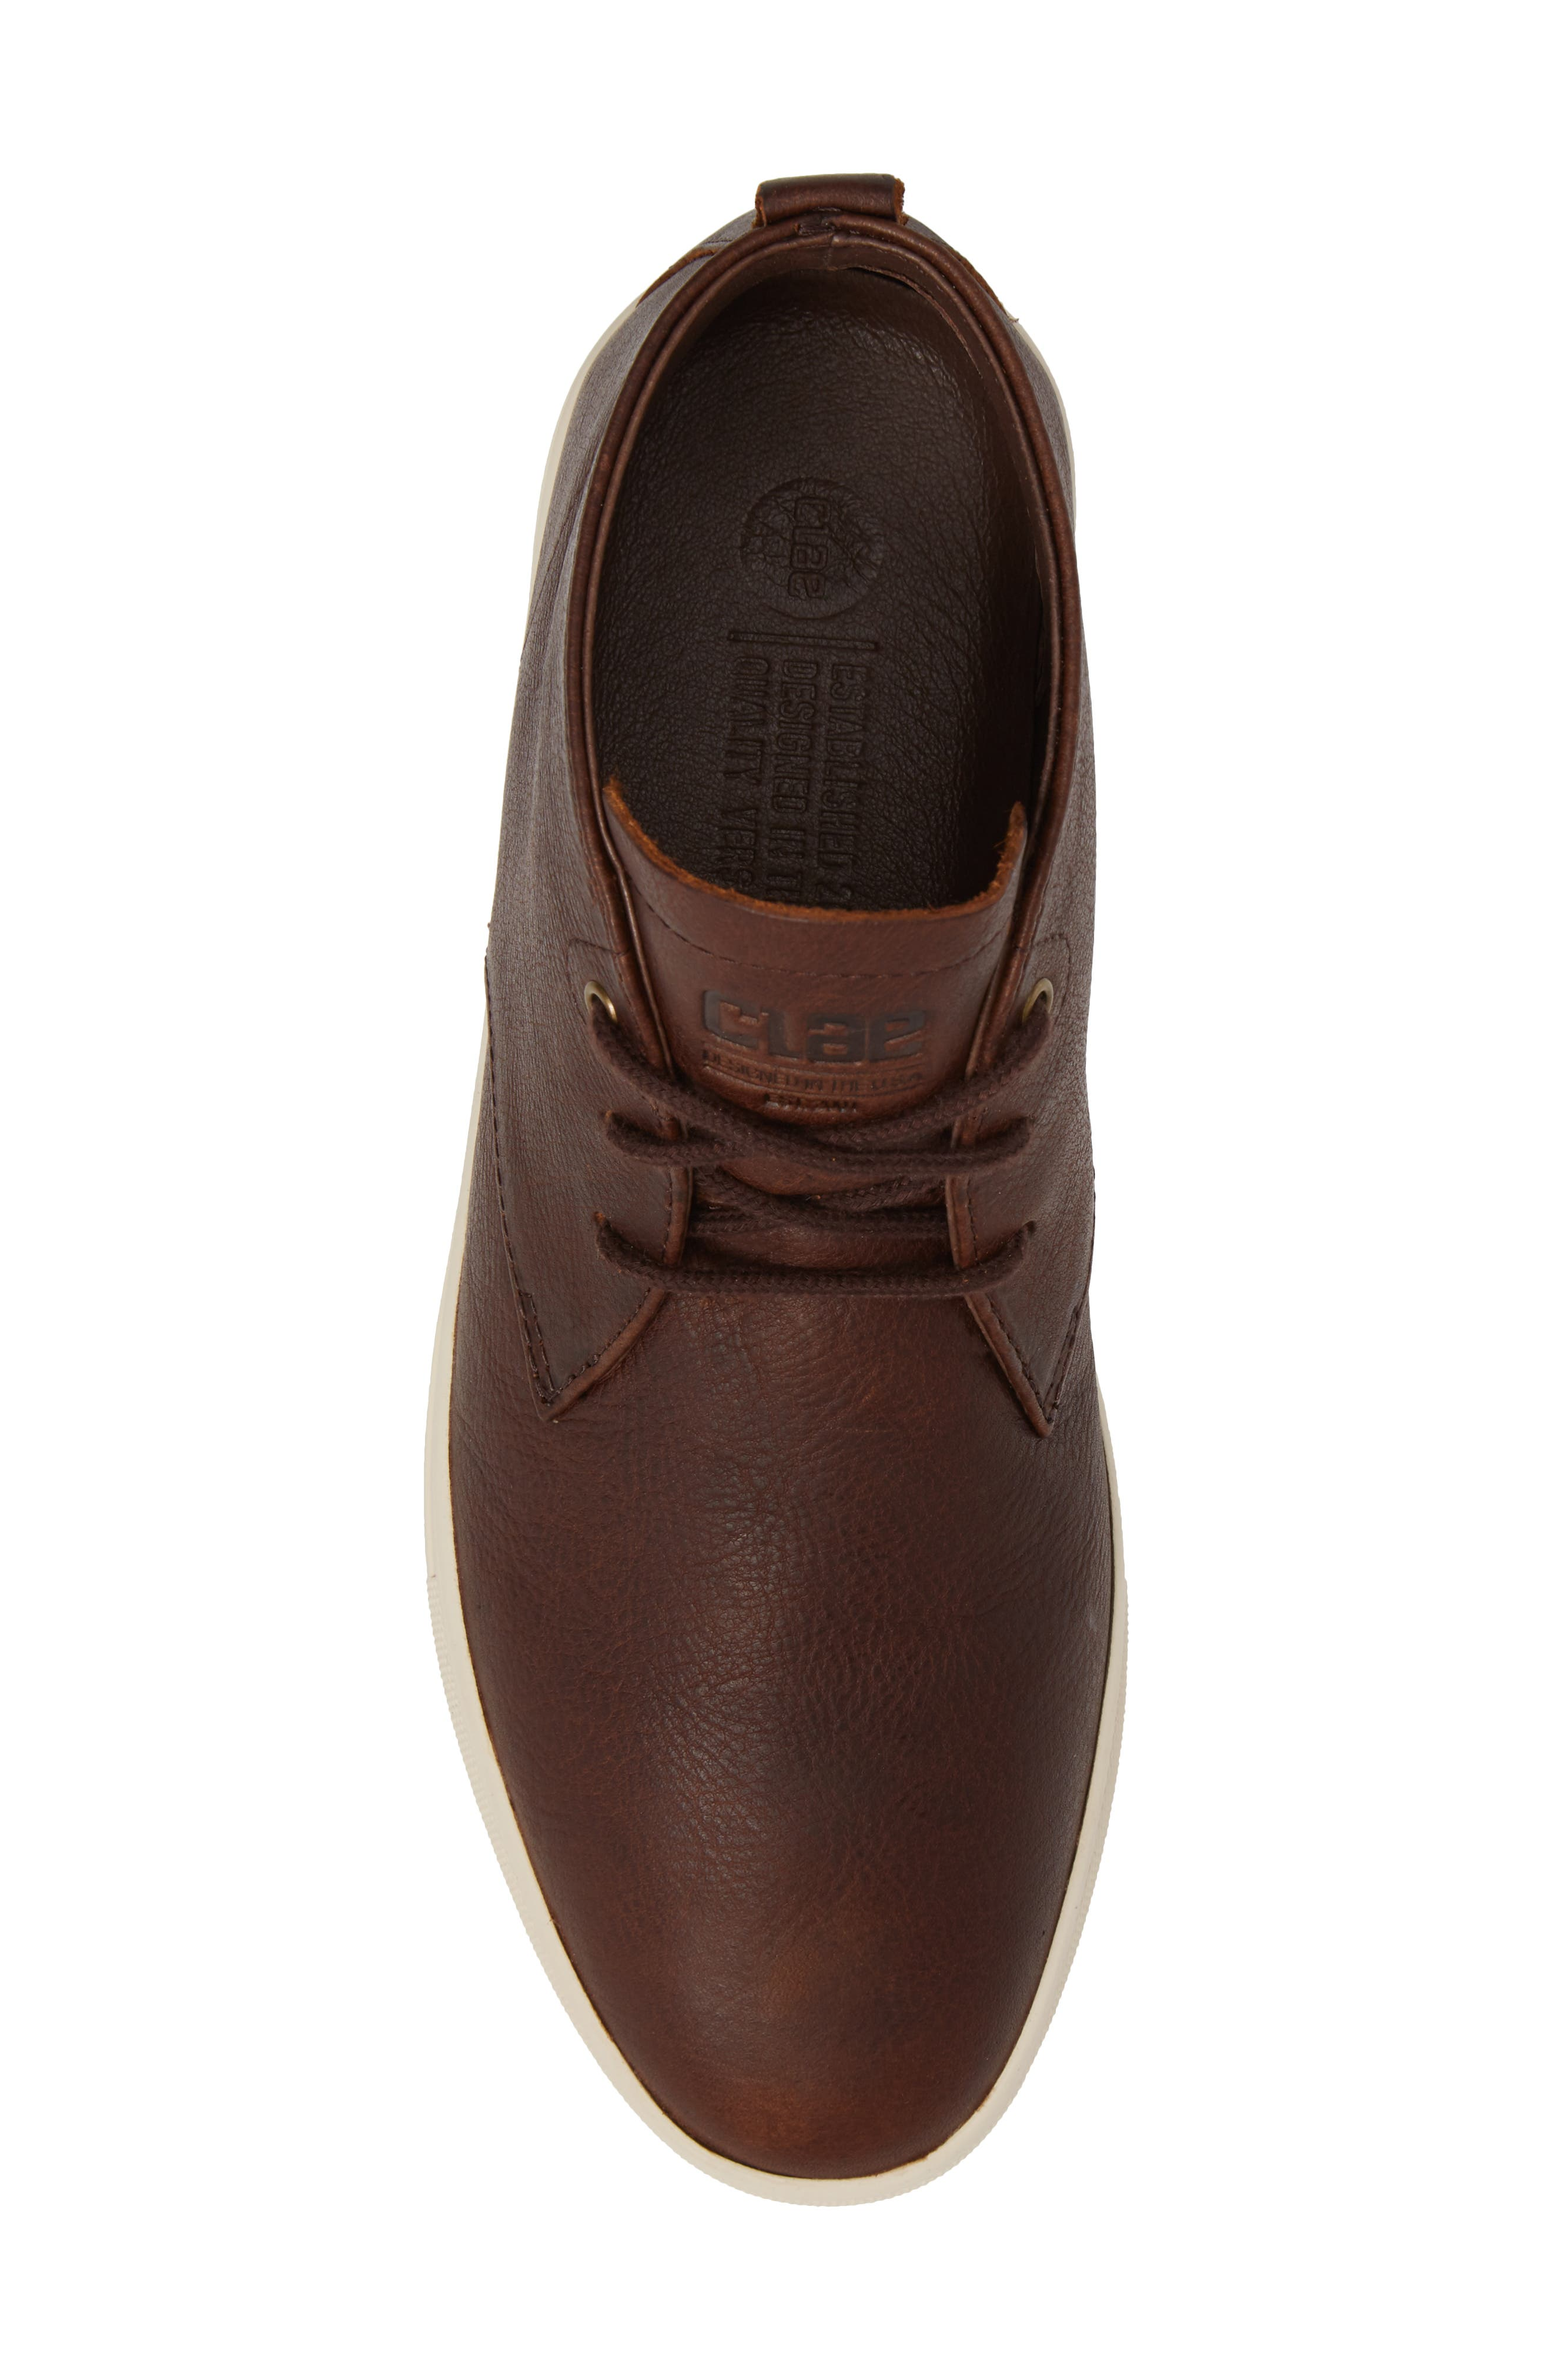 'Strayhorn SP' Chukka Boot,                             Alternate thumbnail 5, color,                             Cocoa Leather